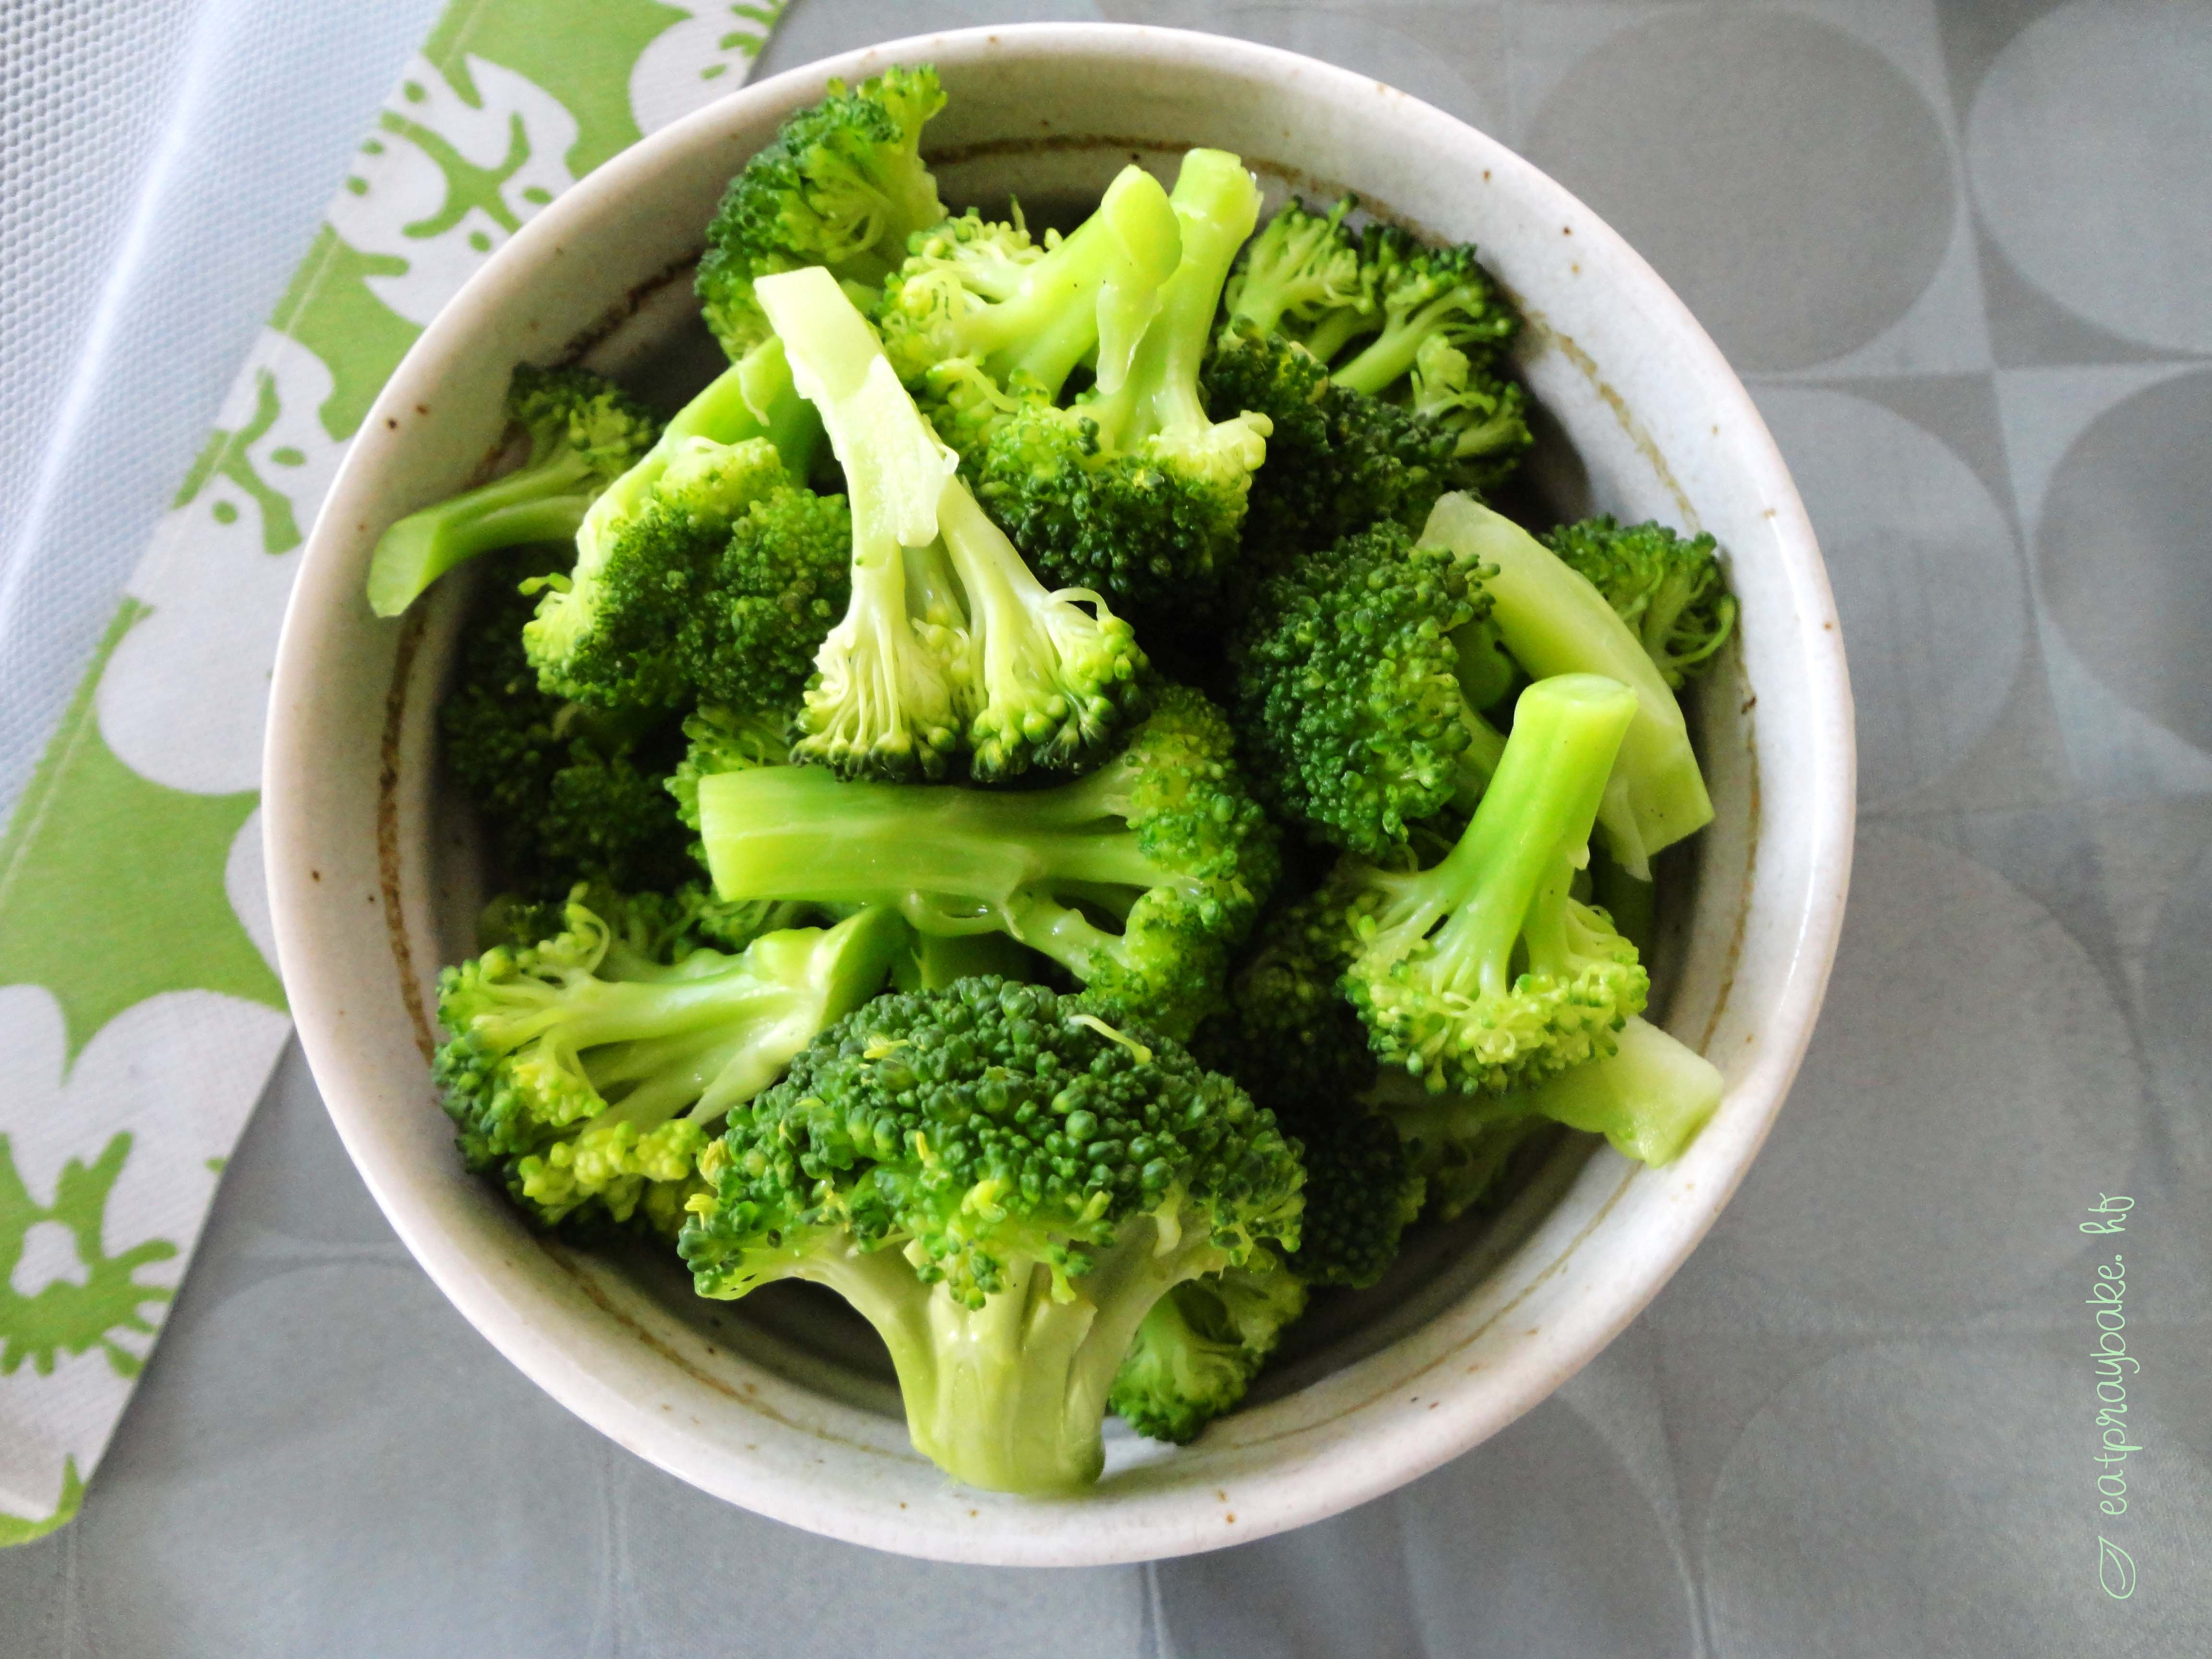 Dampak Negatif Efek Samping Diet Rendah Karbohidrat